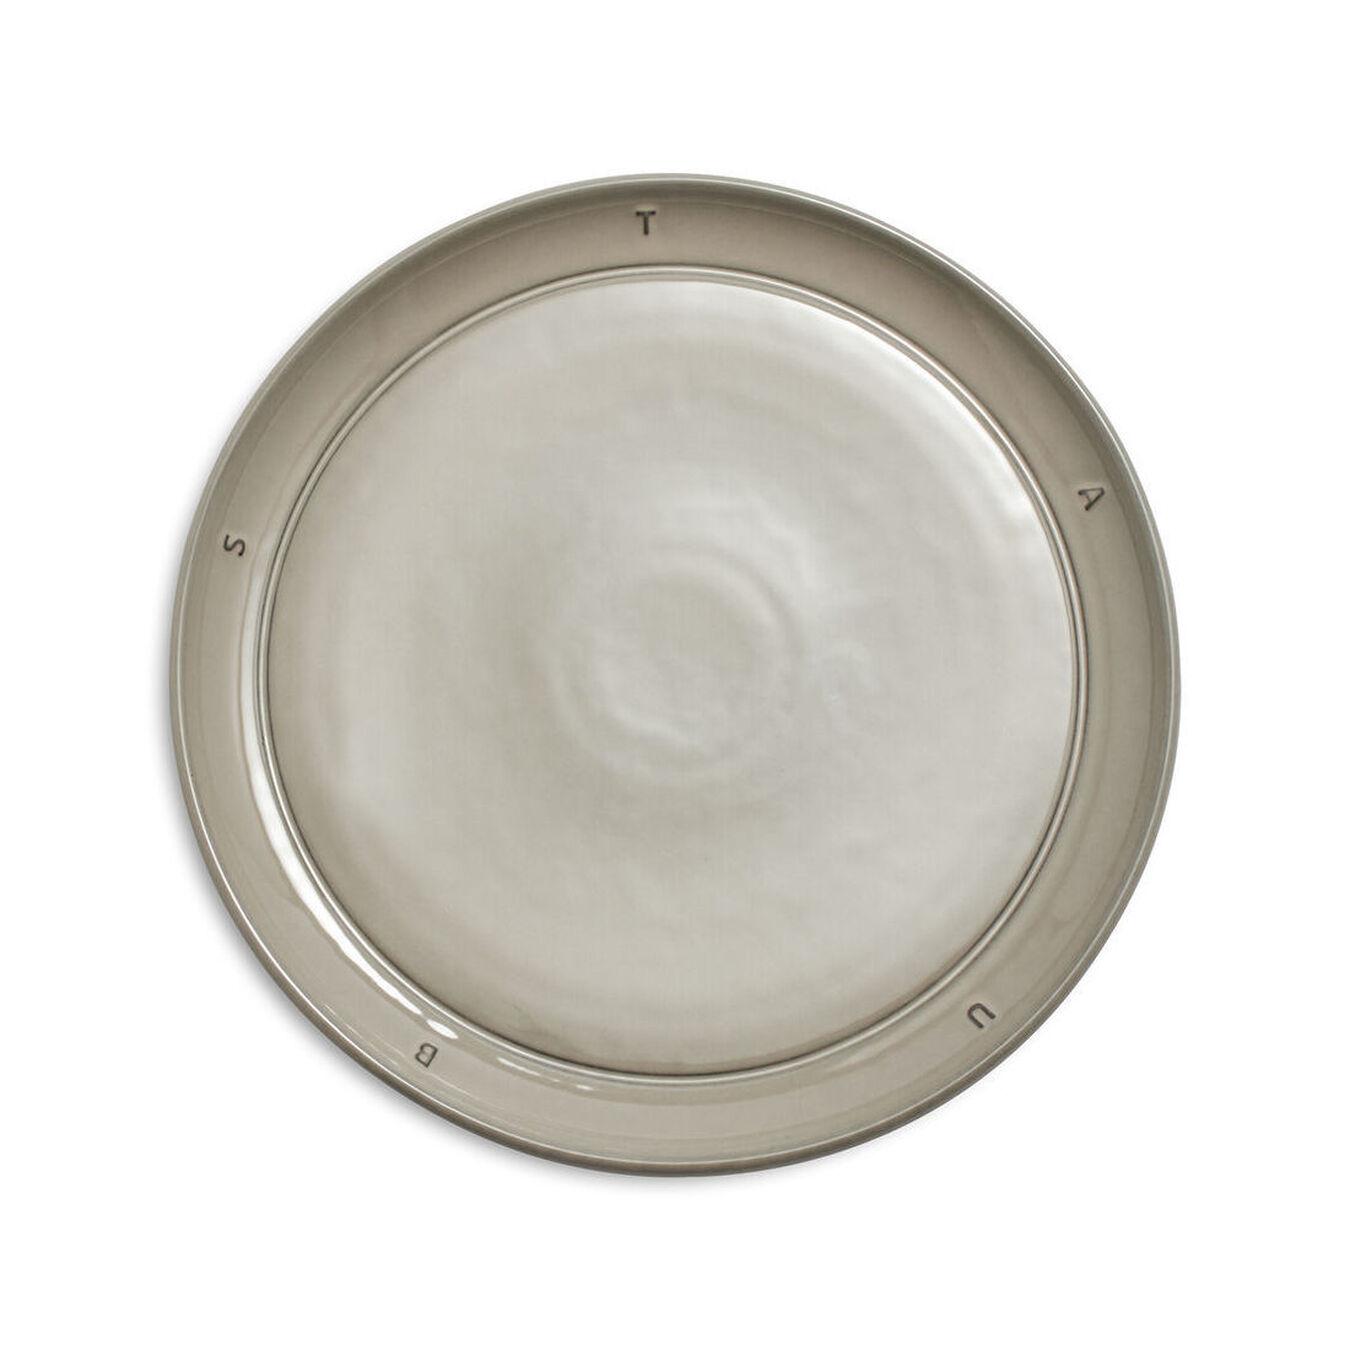 "8.5-inch, Salad Plate 22cm / 8.6"" - Graphite, Graphite Grey,,large 1"